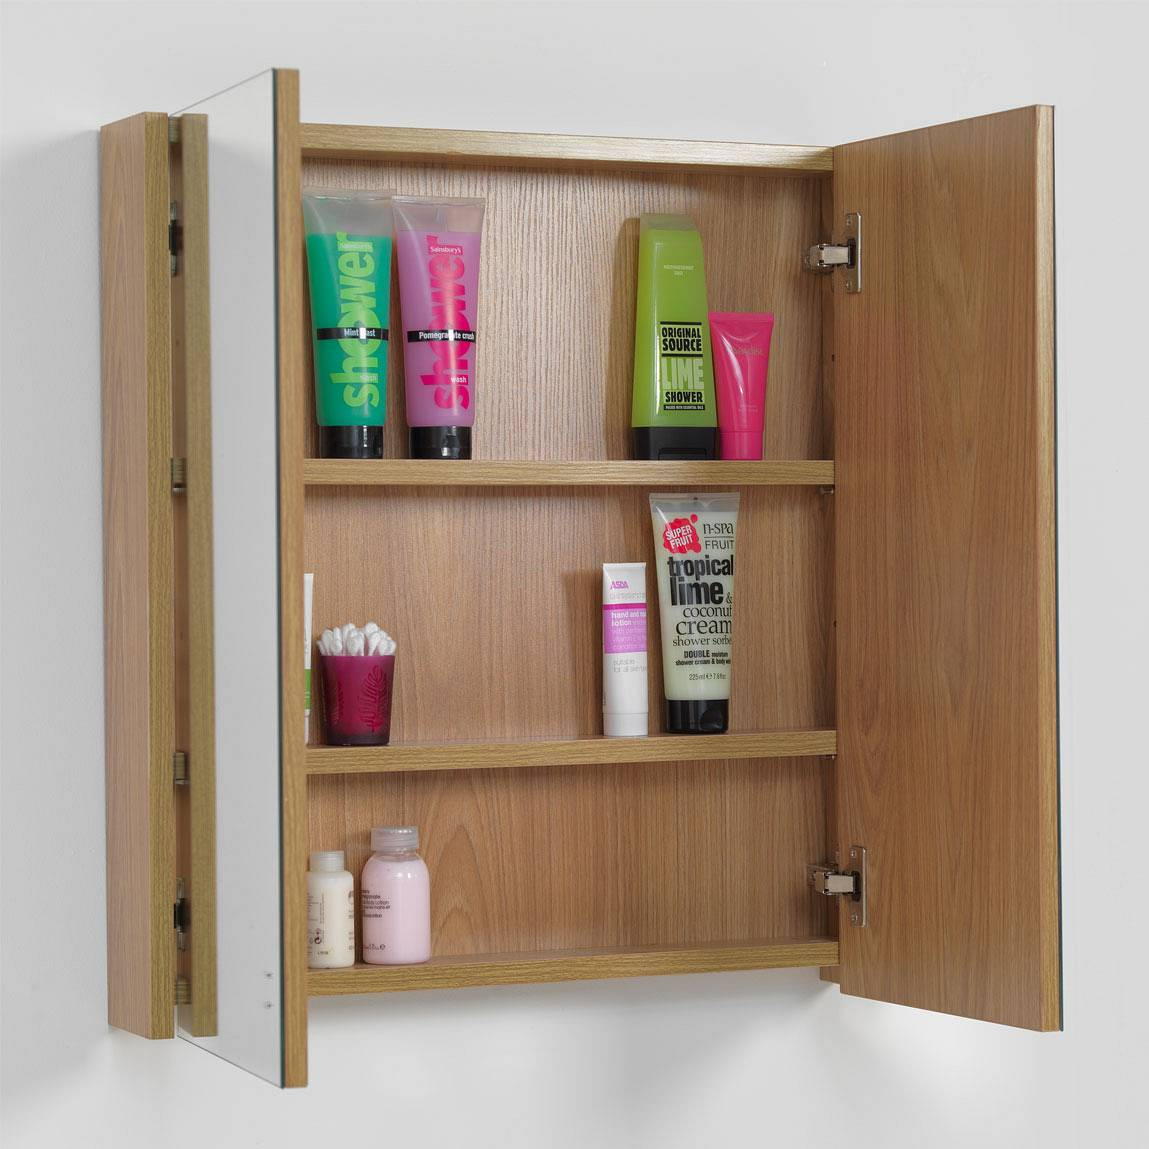 1 x victoria plumb teak mirrored bathroom wall cabinet for Bathroom cabinets victoria plumb